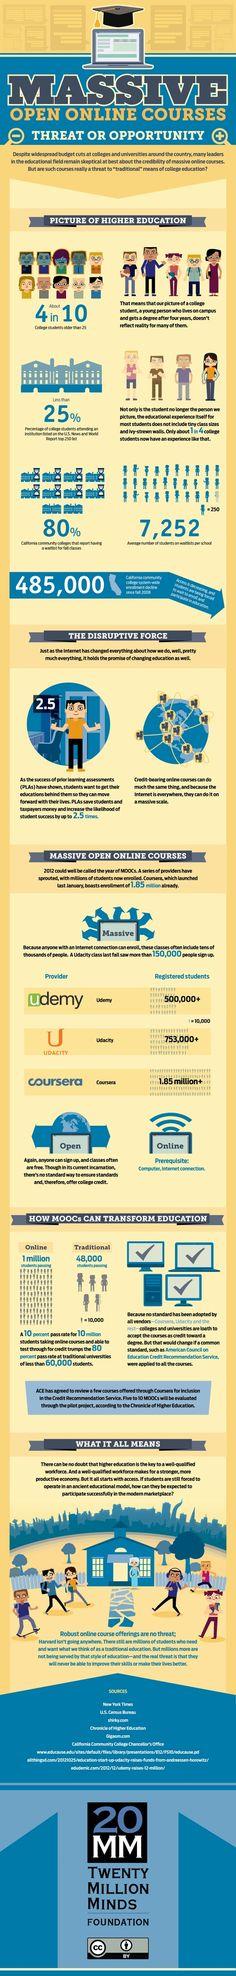 MOOC- threat or opportunity?http://14434396.r.lightningbase-cdn.com/wp-content/uploads/mooc-infographic.jpg